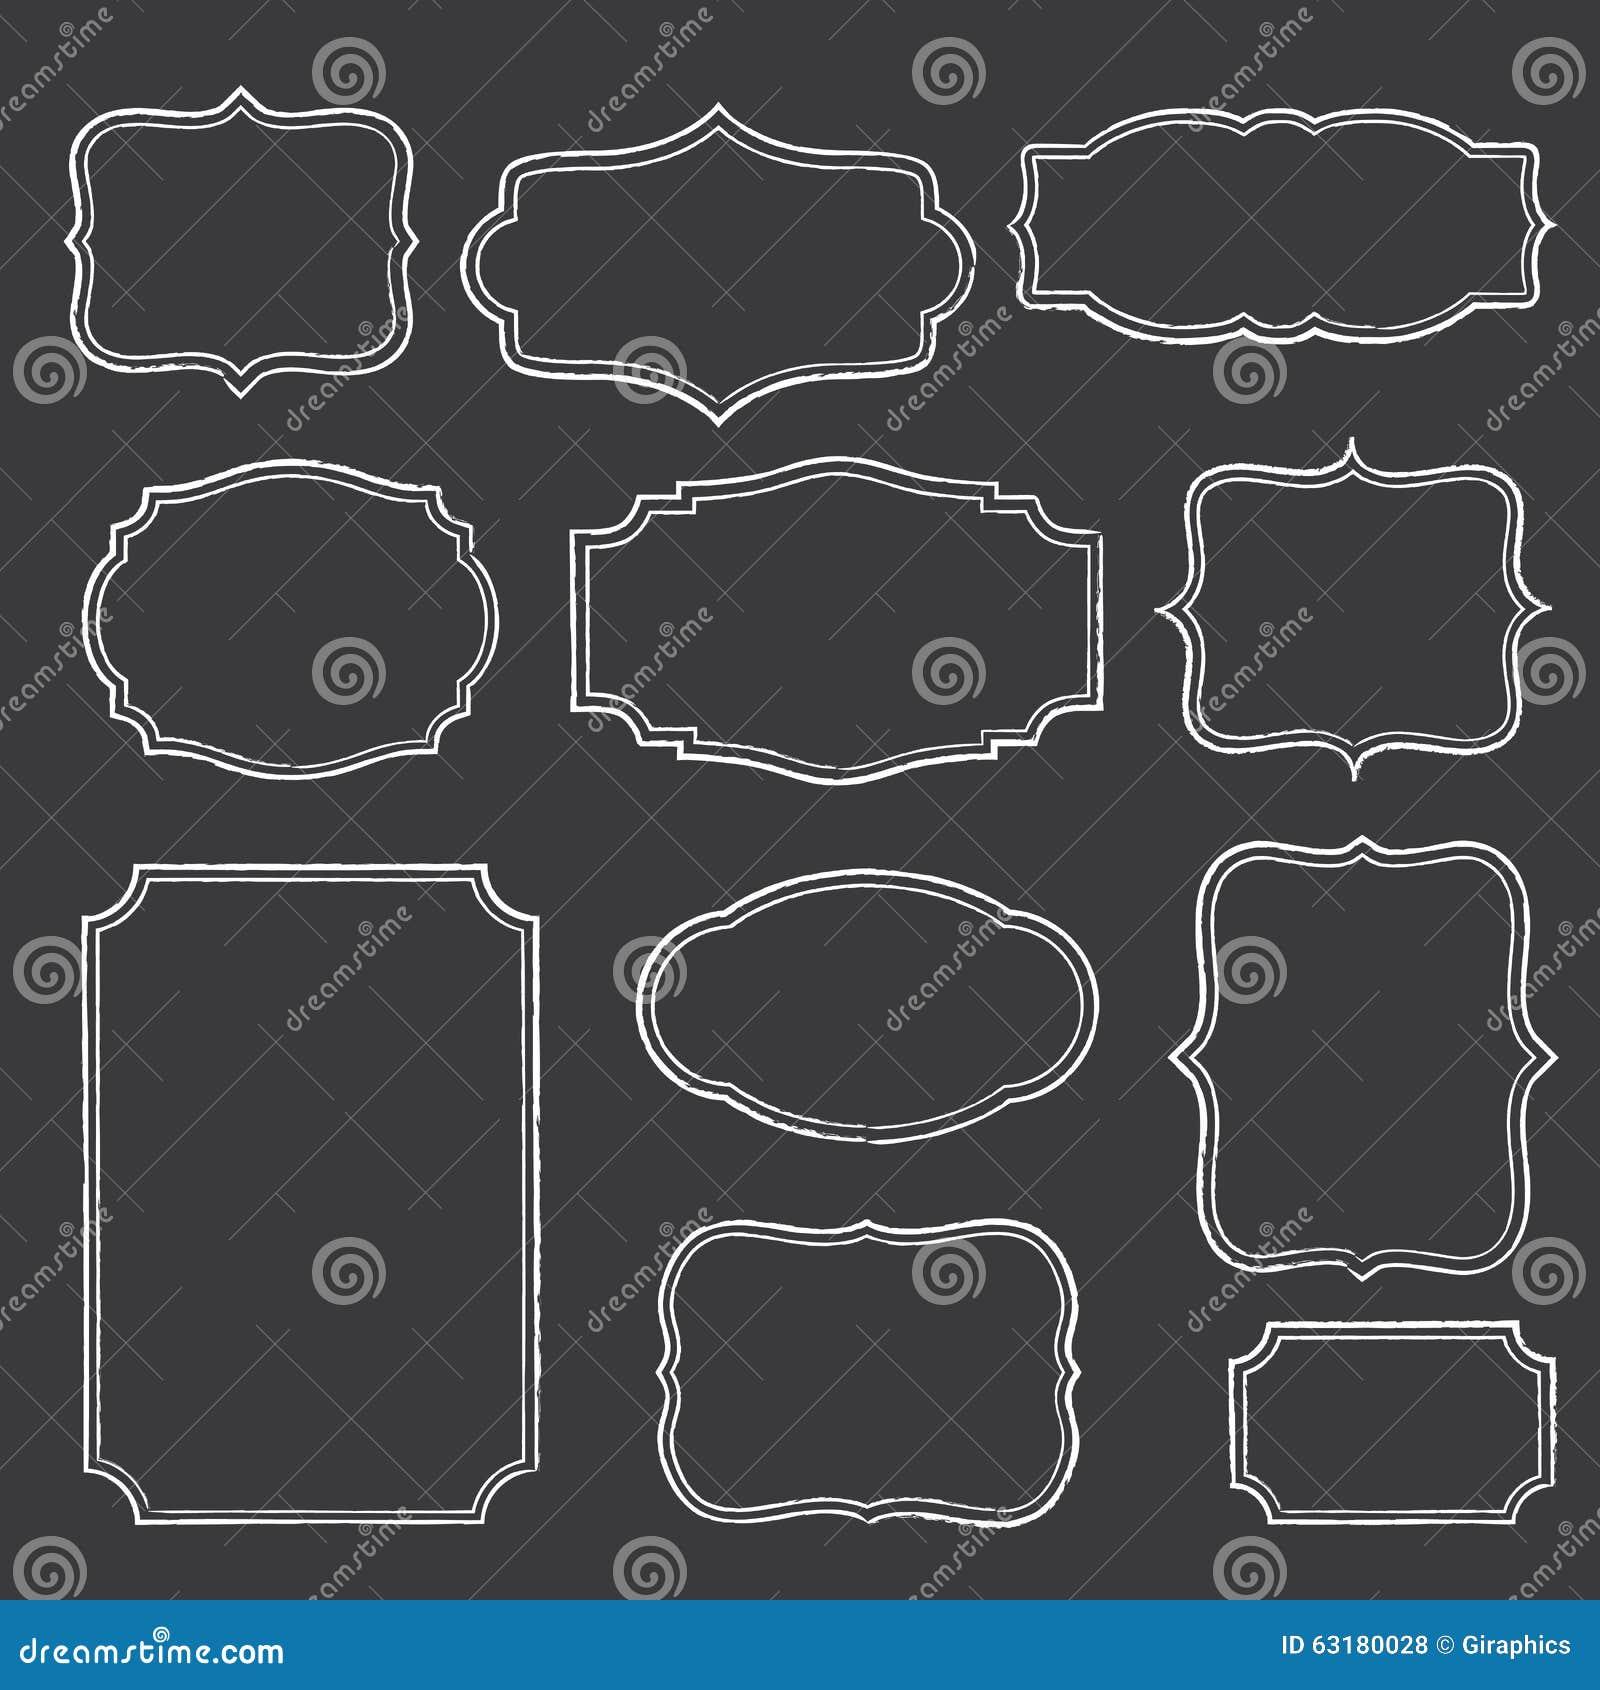 Tafel-Rahmen vektor abbildung. Illustration von ansage - 63180028